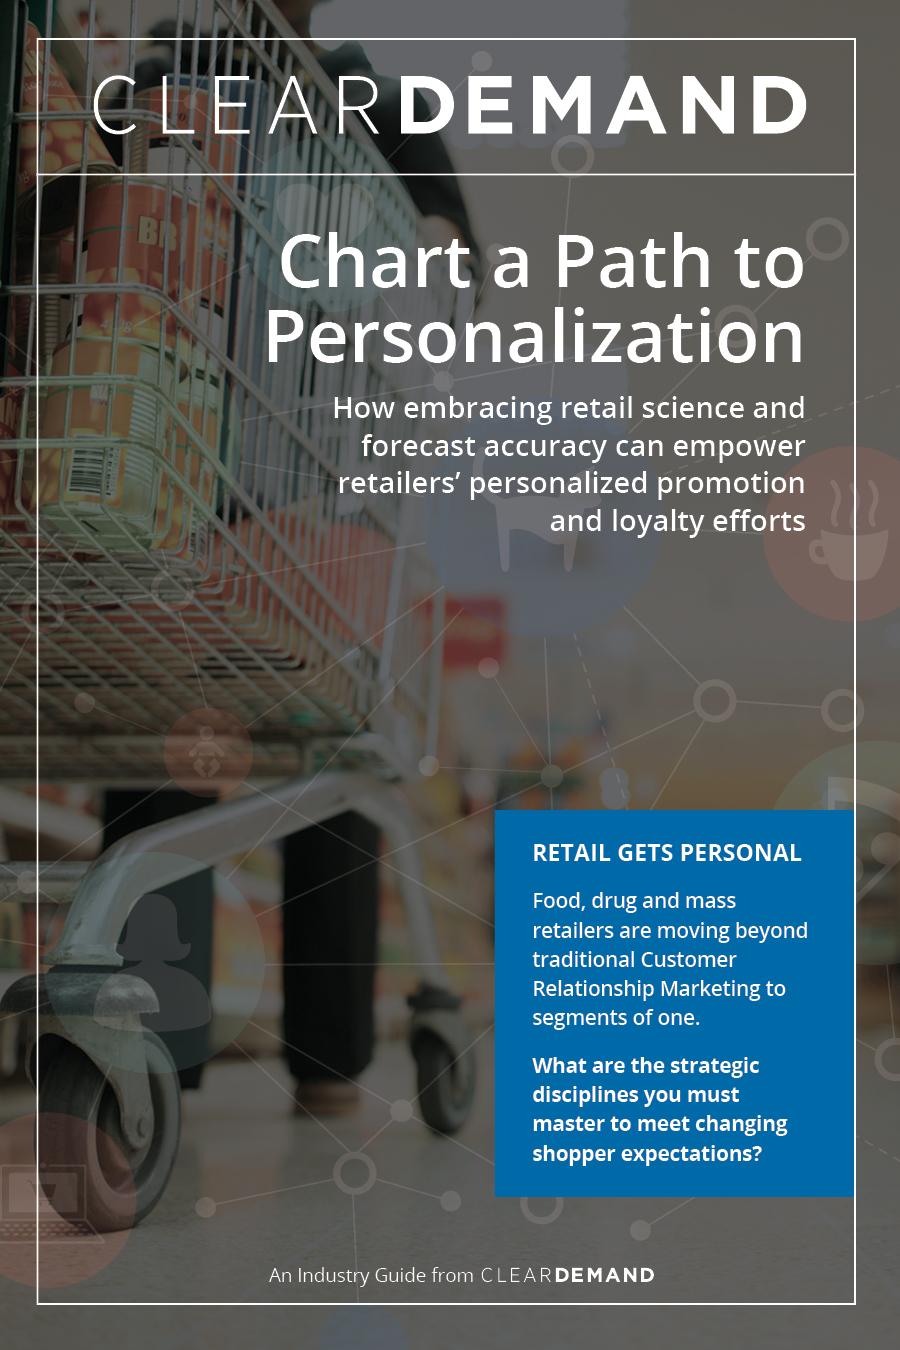 Chart a Path to Personalization